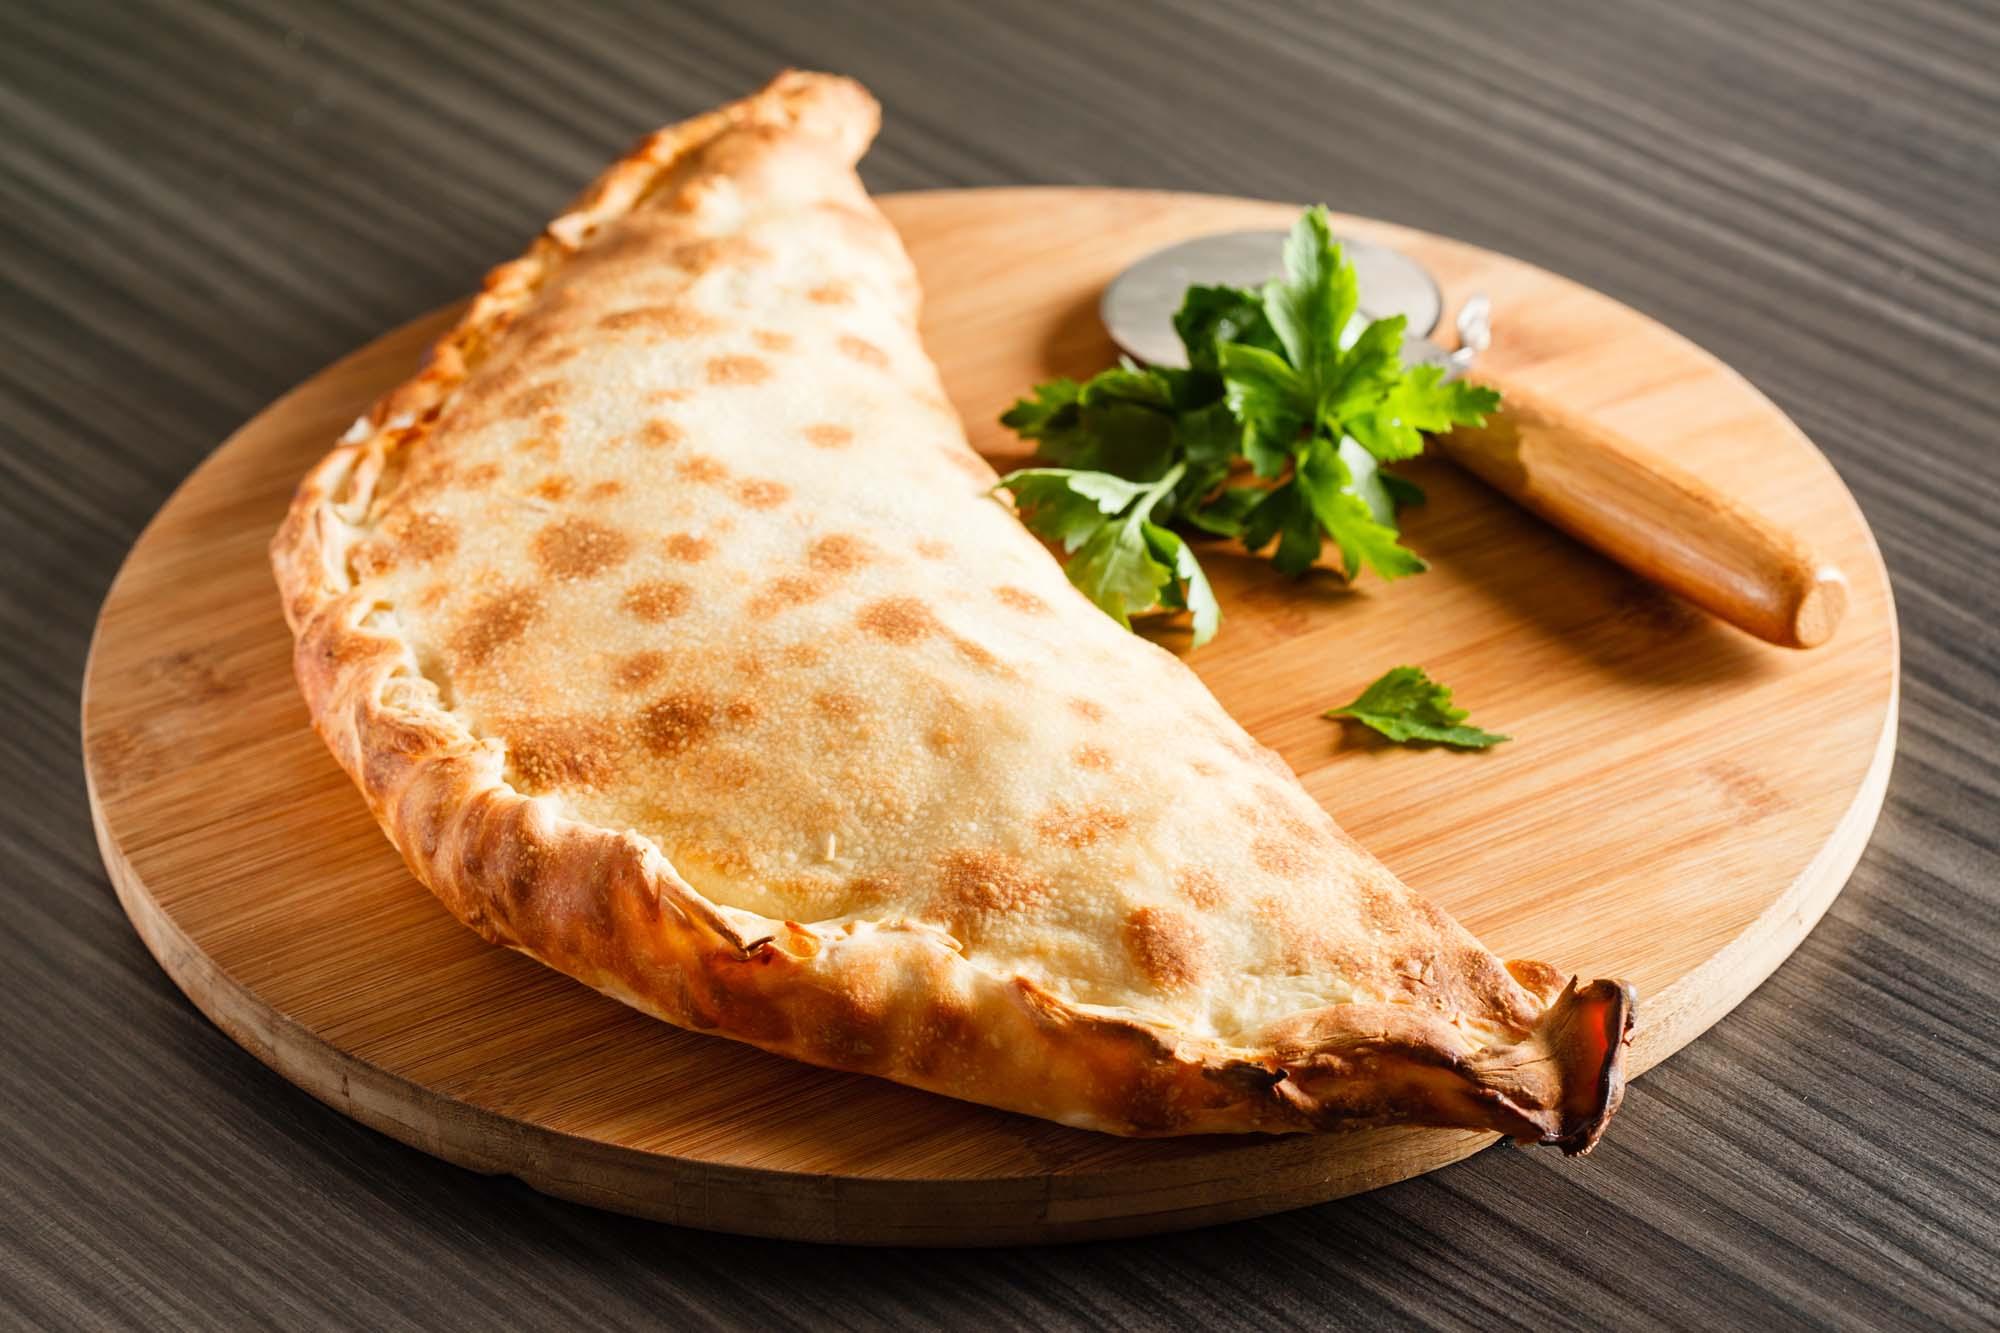 Indbagt pizza (Calzone)